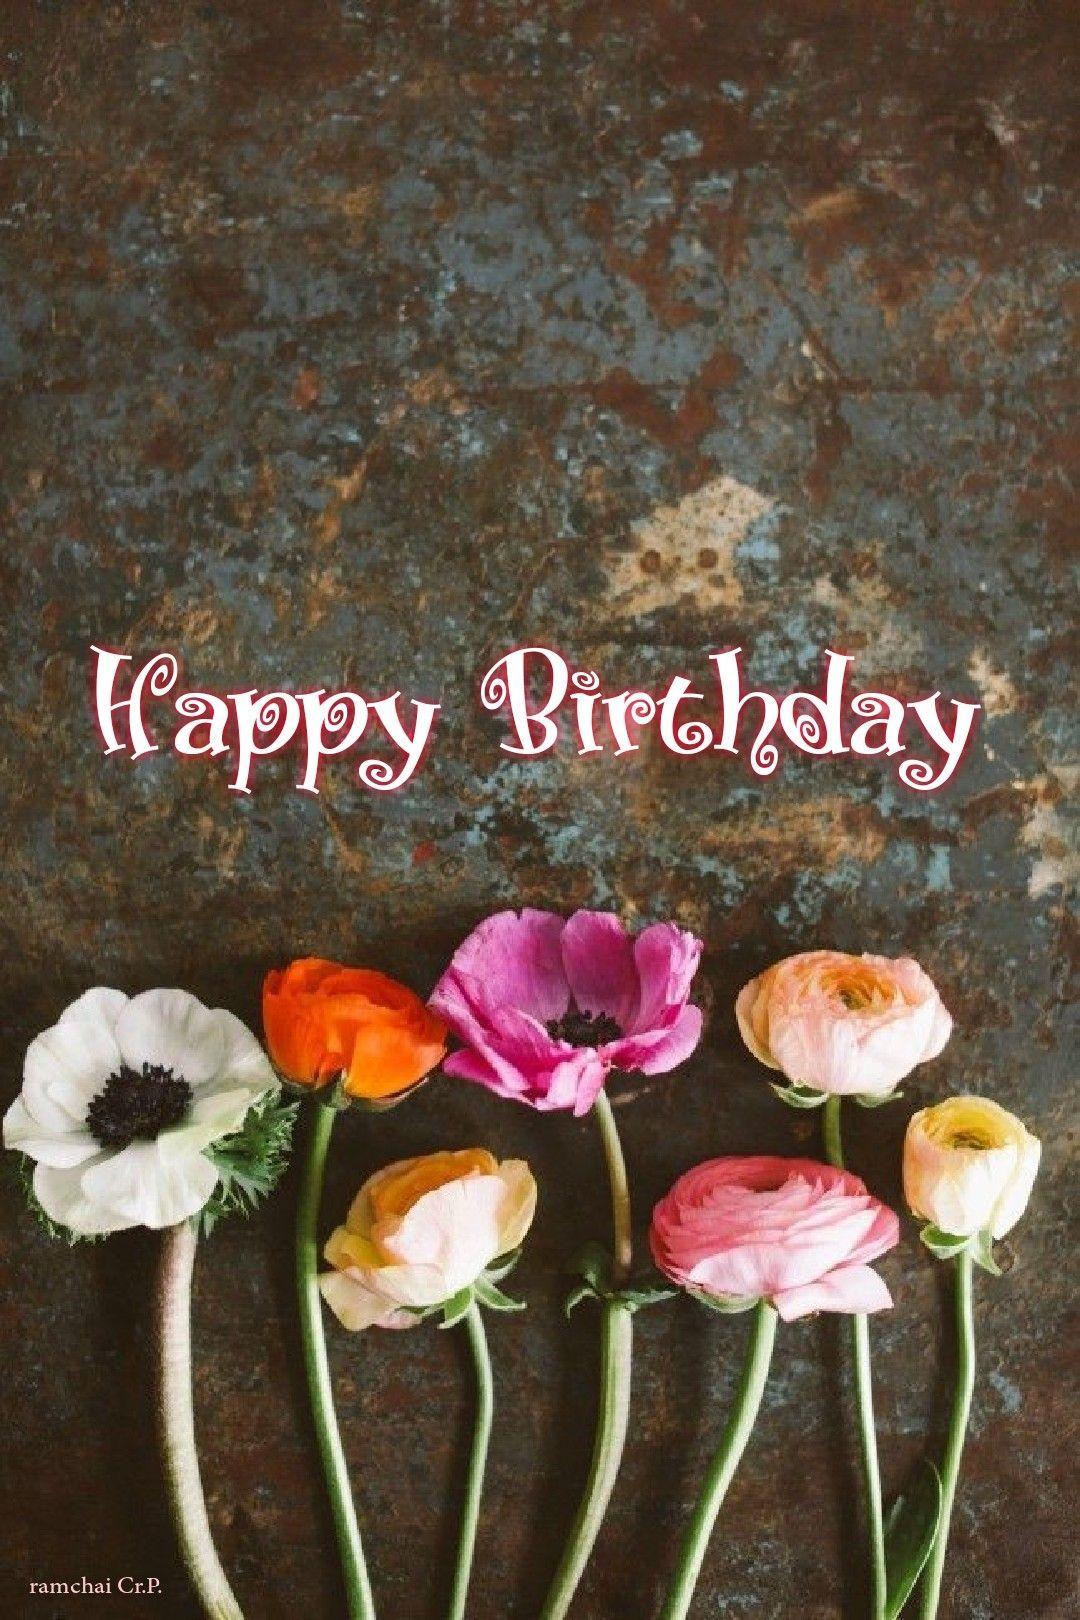 Pin By Chandra Journey On Happy Birthday In 2021 Free Happy Birthday Cards Birthday Wishes Flowers Happy Birthday Flower